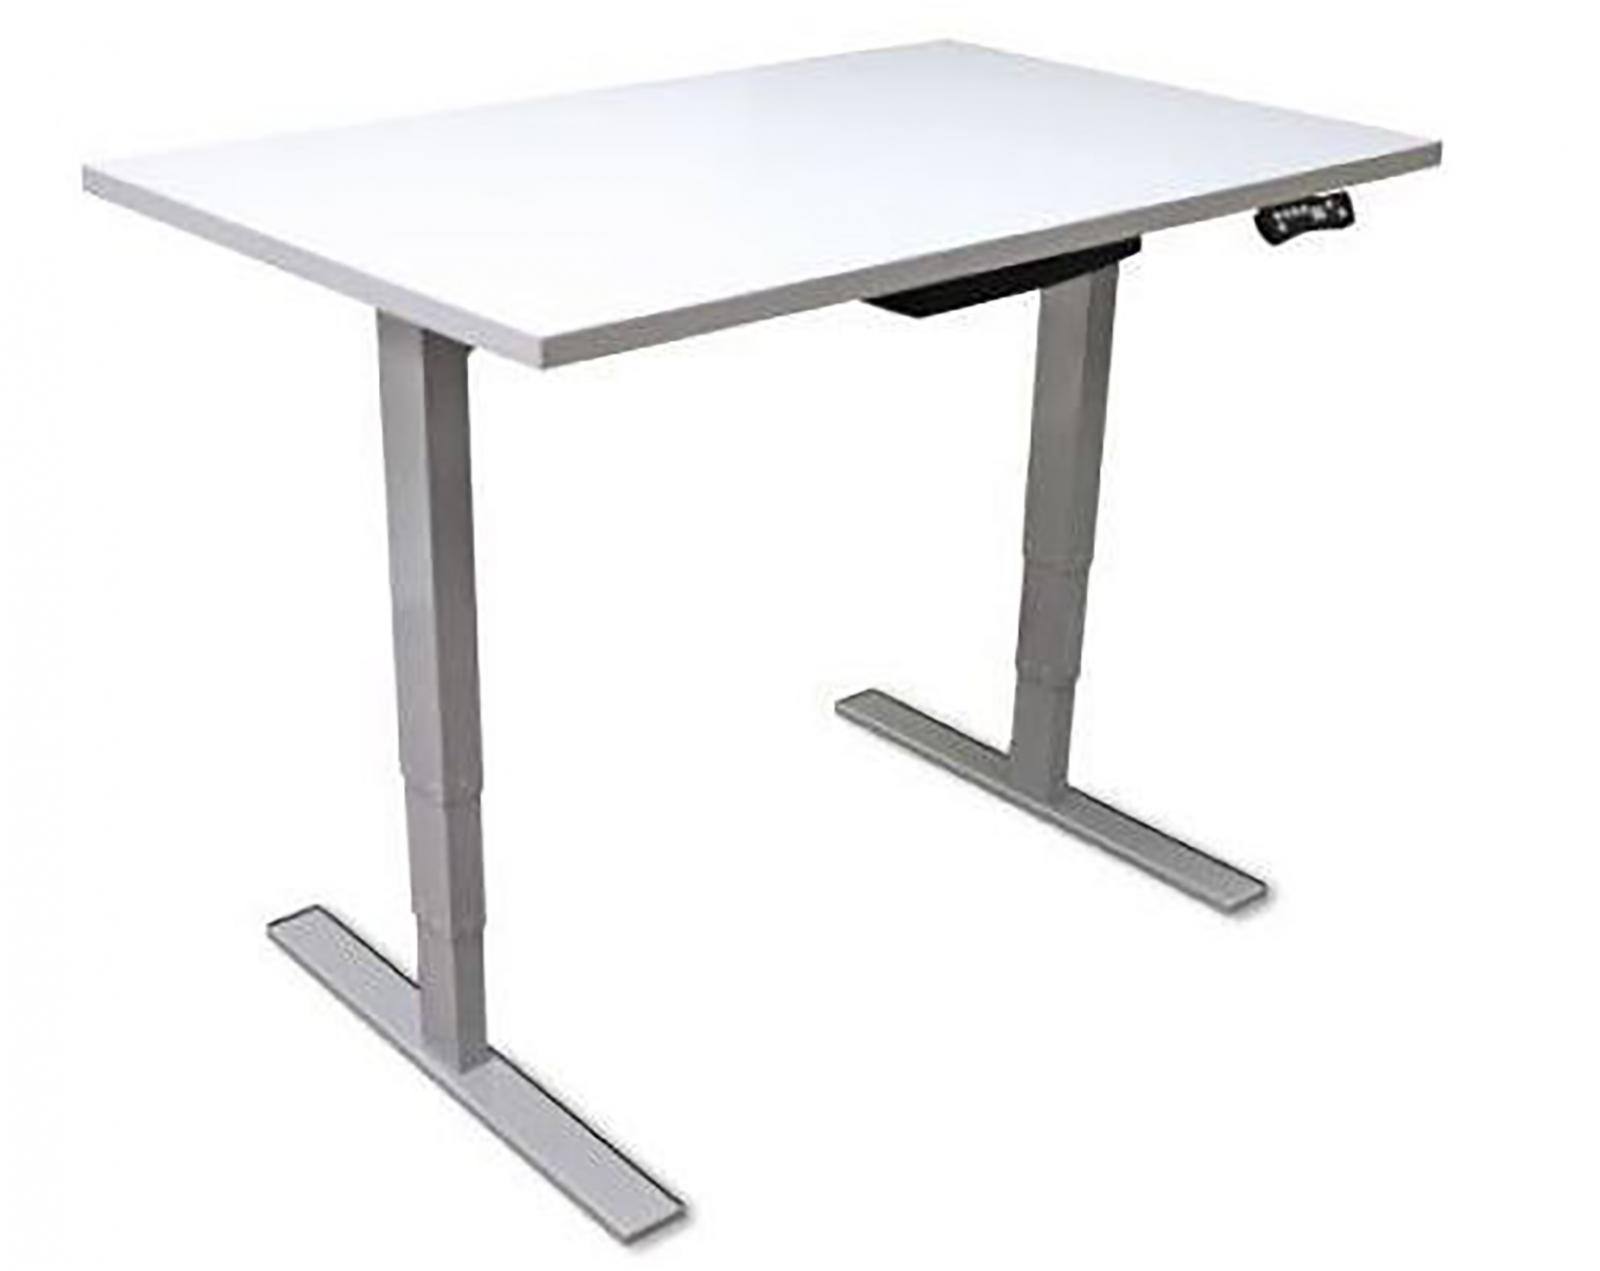 Symmetry Apollo III Adjustable Height Desk